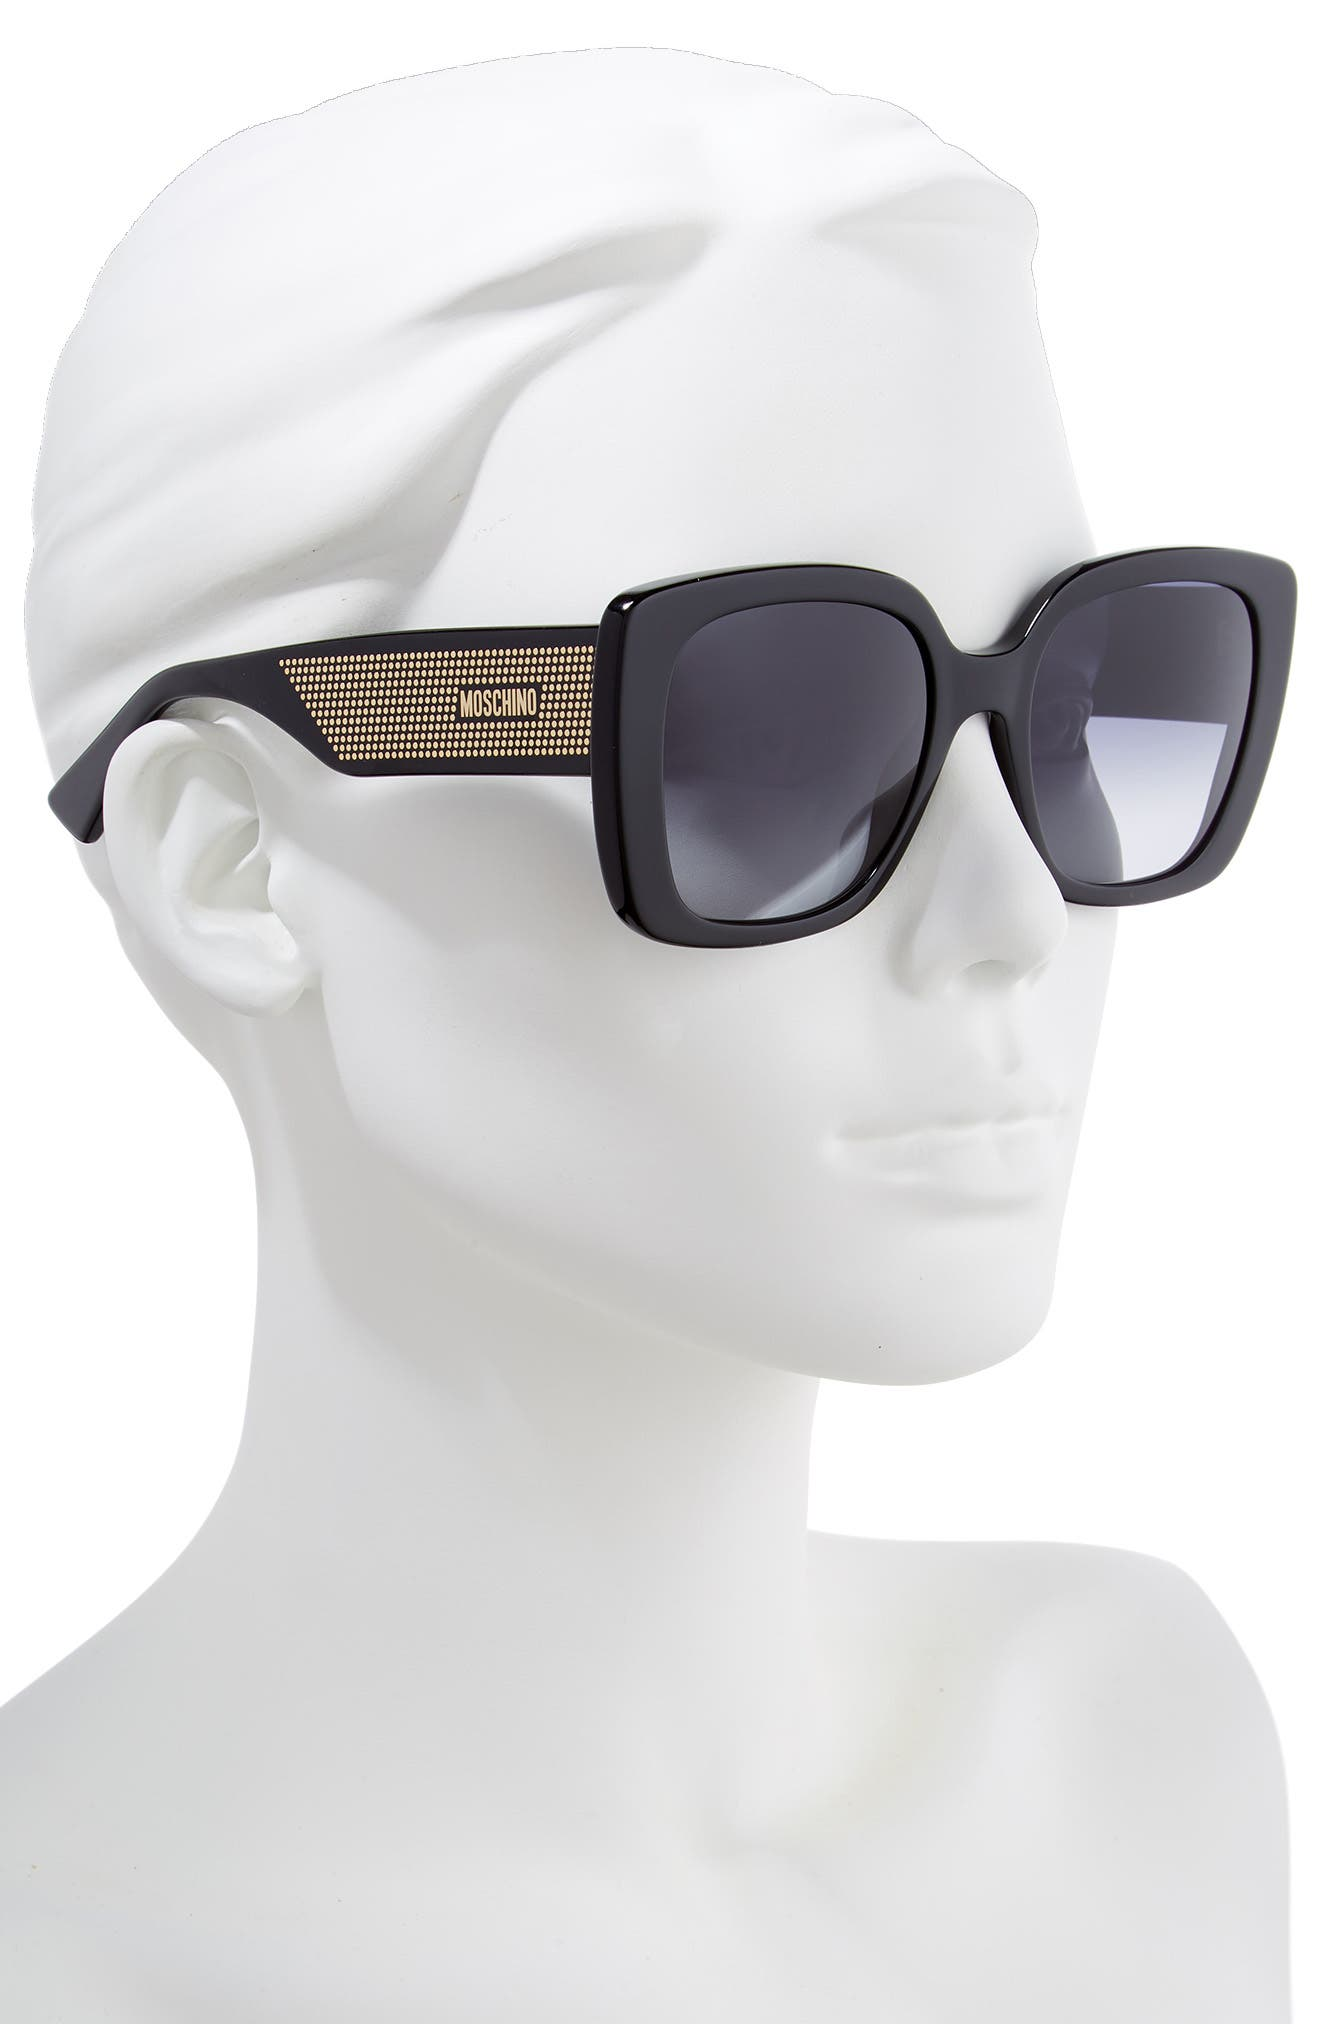 MOSCHINO, 54mm Square Sunglasses, Alternate thumbnail 2, color, BLACK